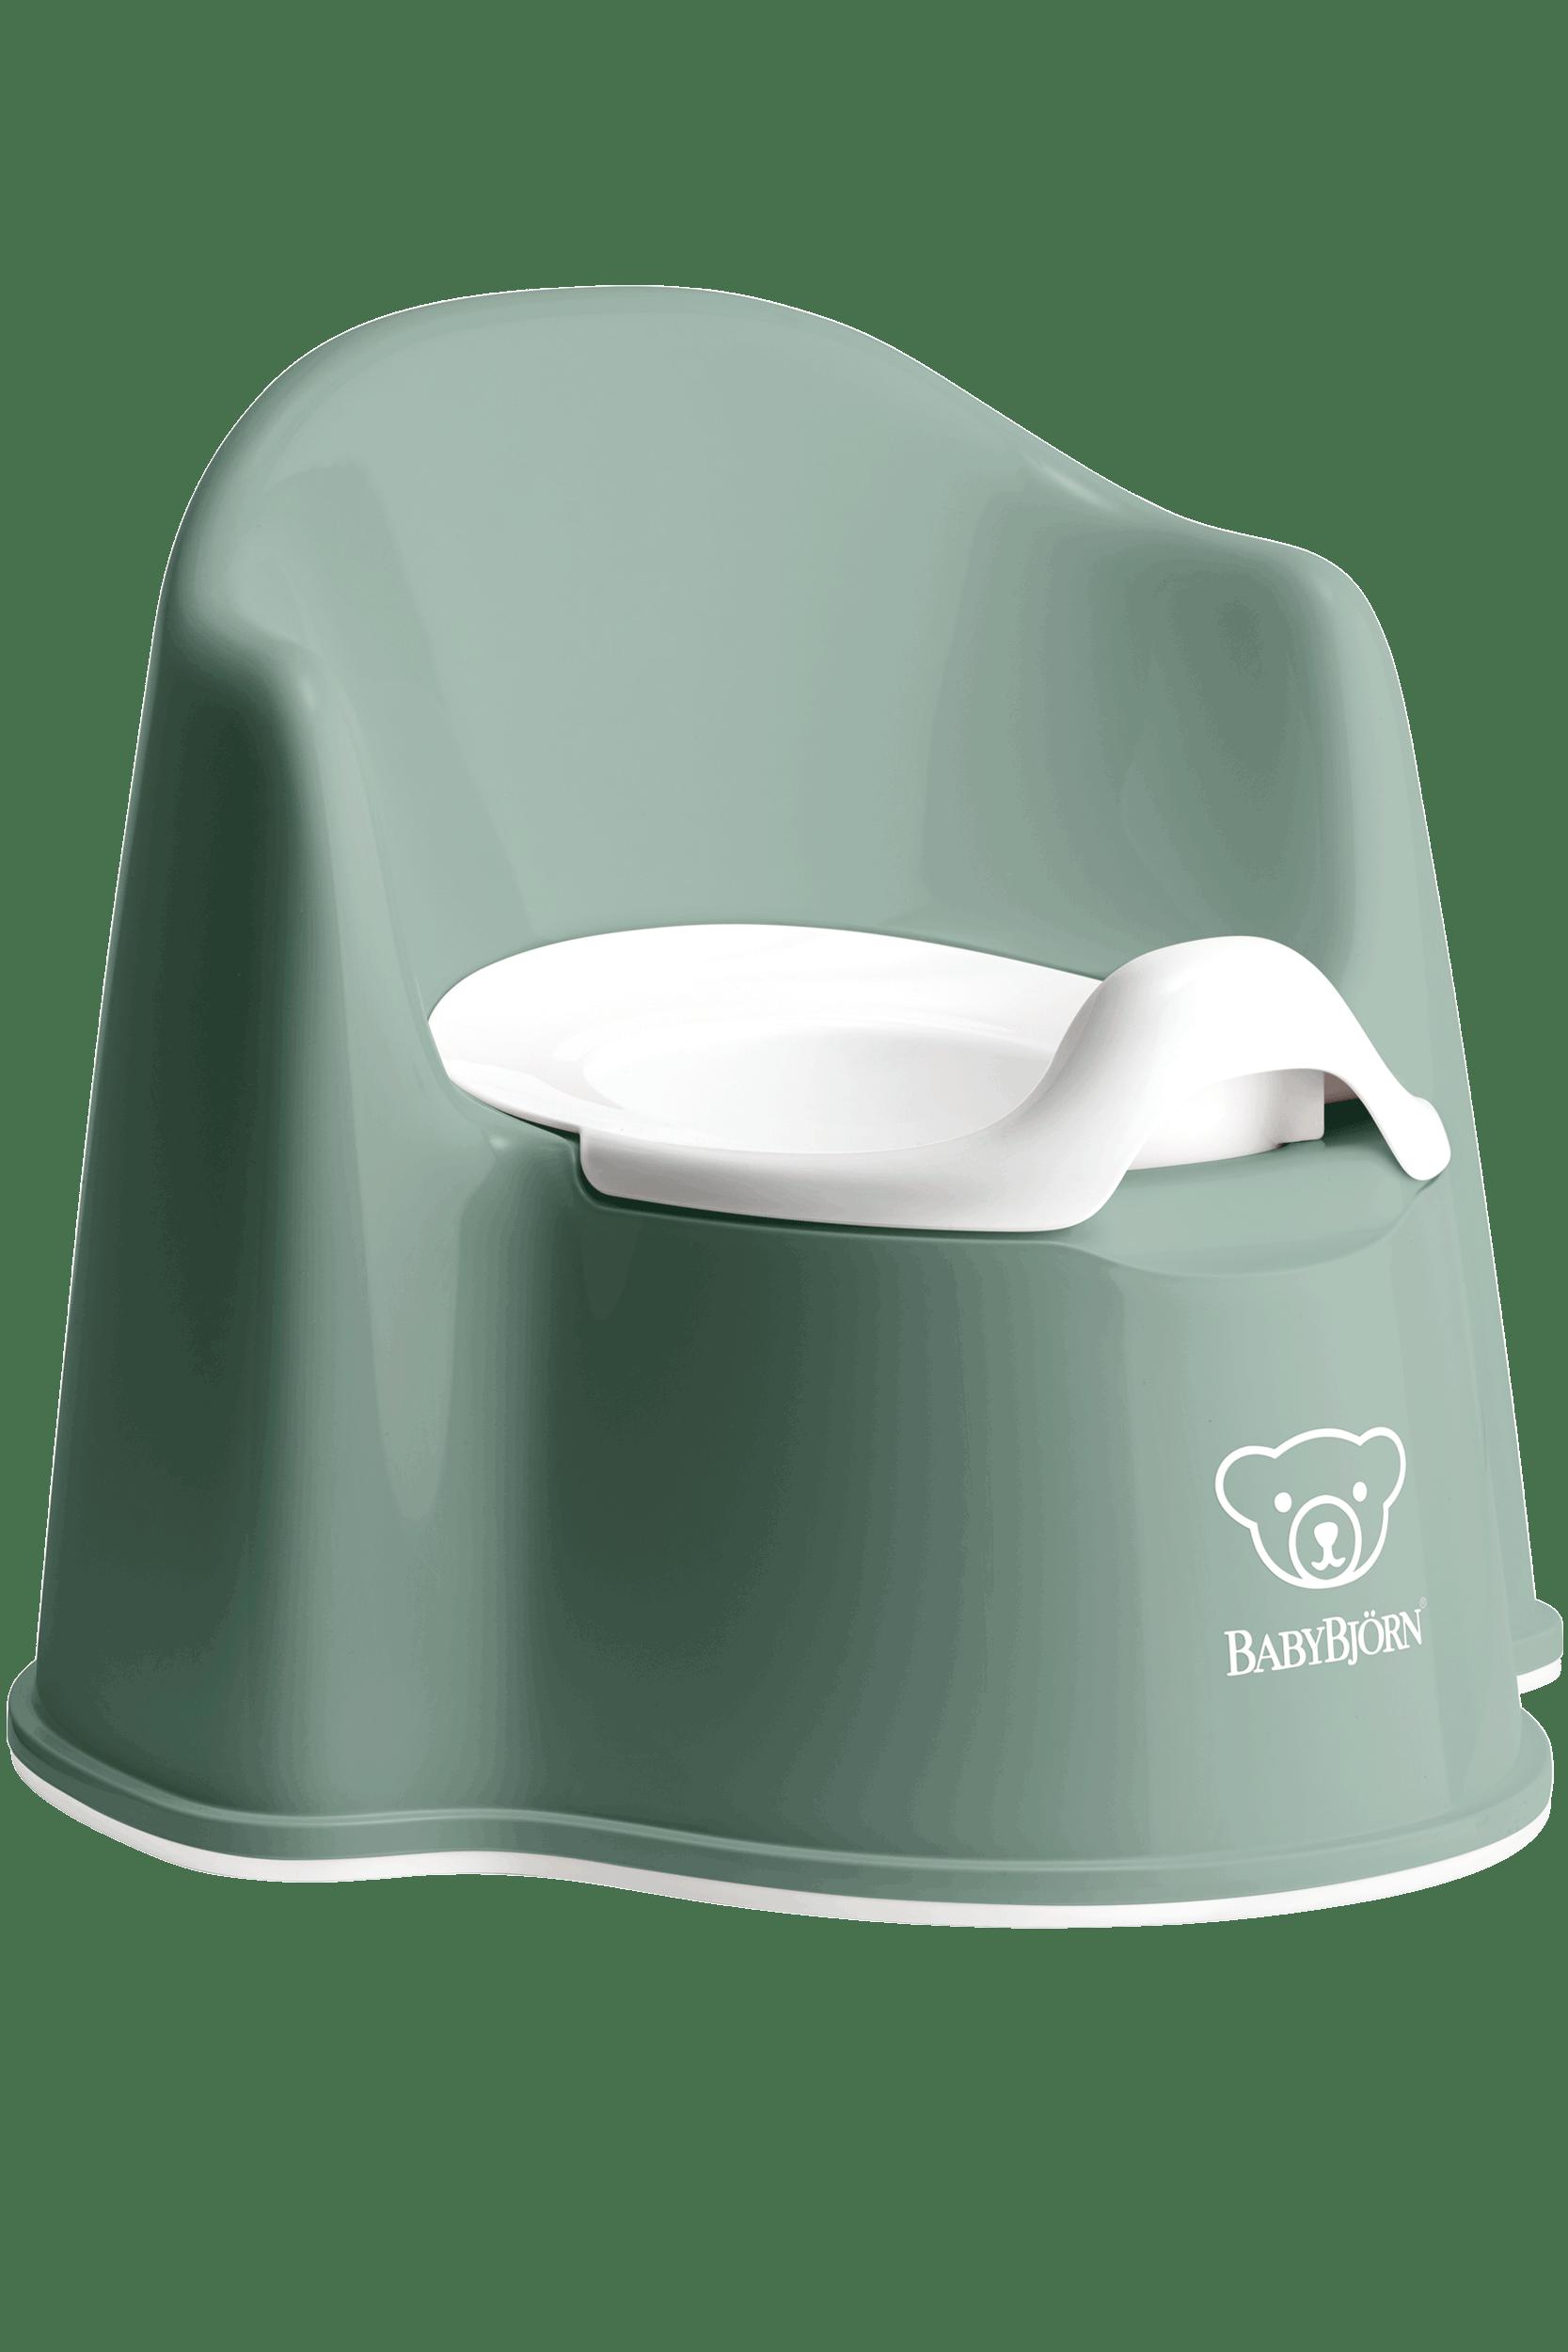 BABYBJÖRN Topfstuhl - Graugrün/Weiß